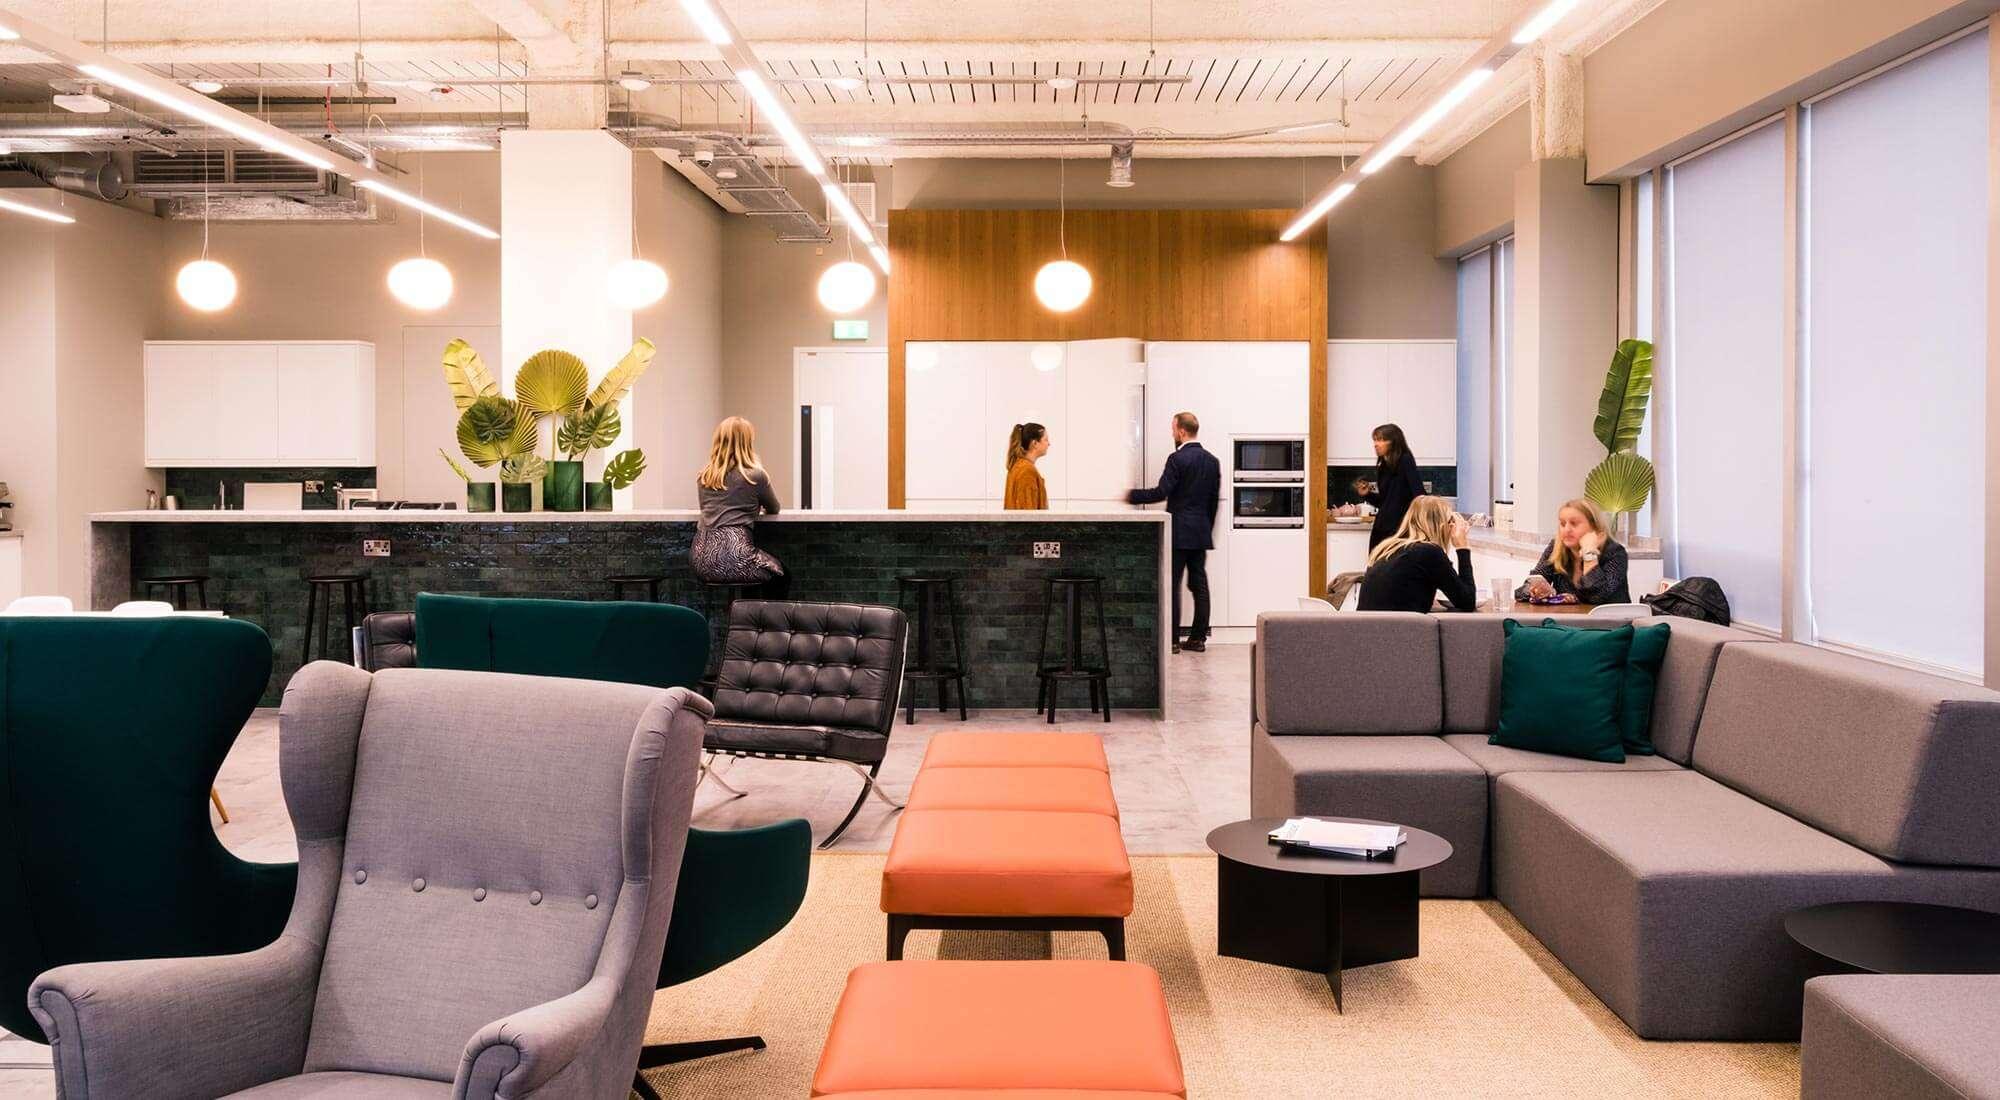 New office design with Kitchen Lounge Foscarini